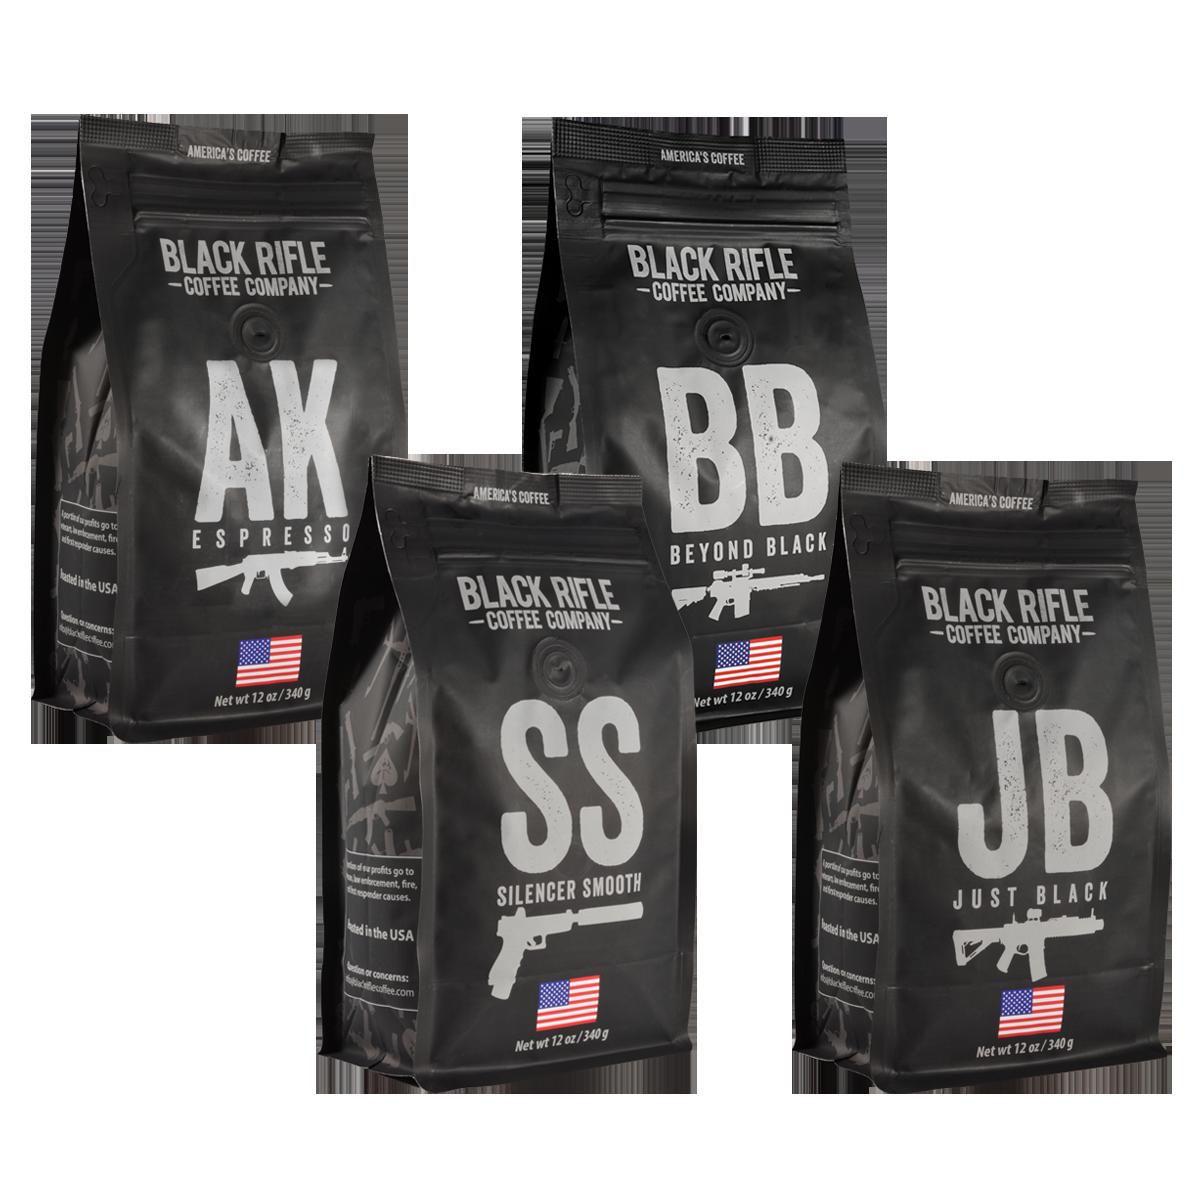 bags of black coffee